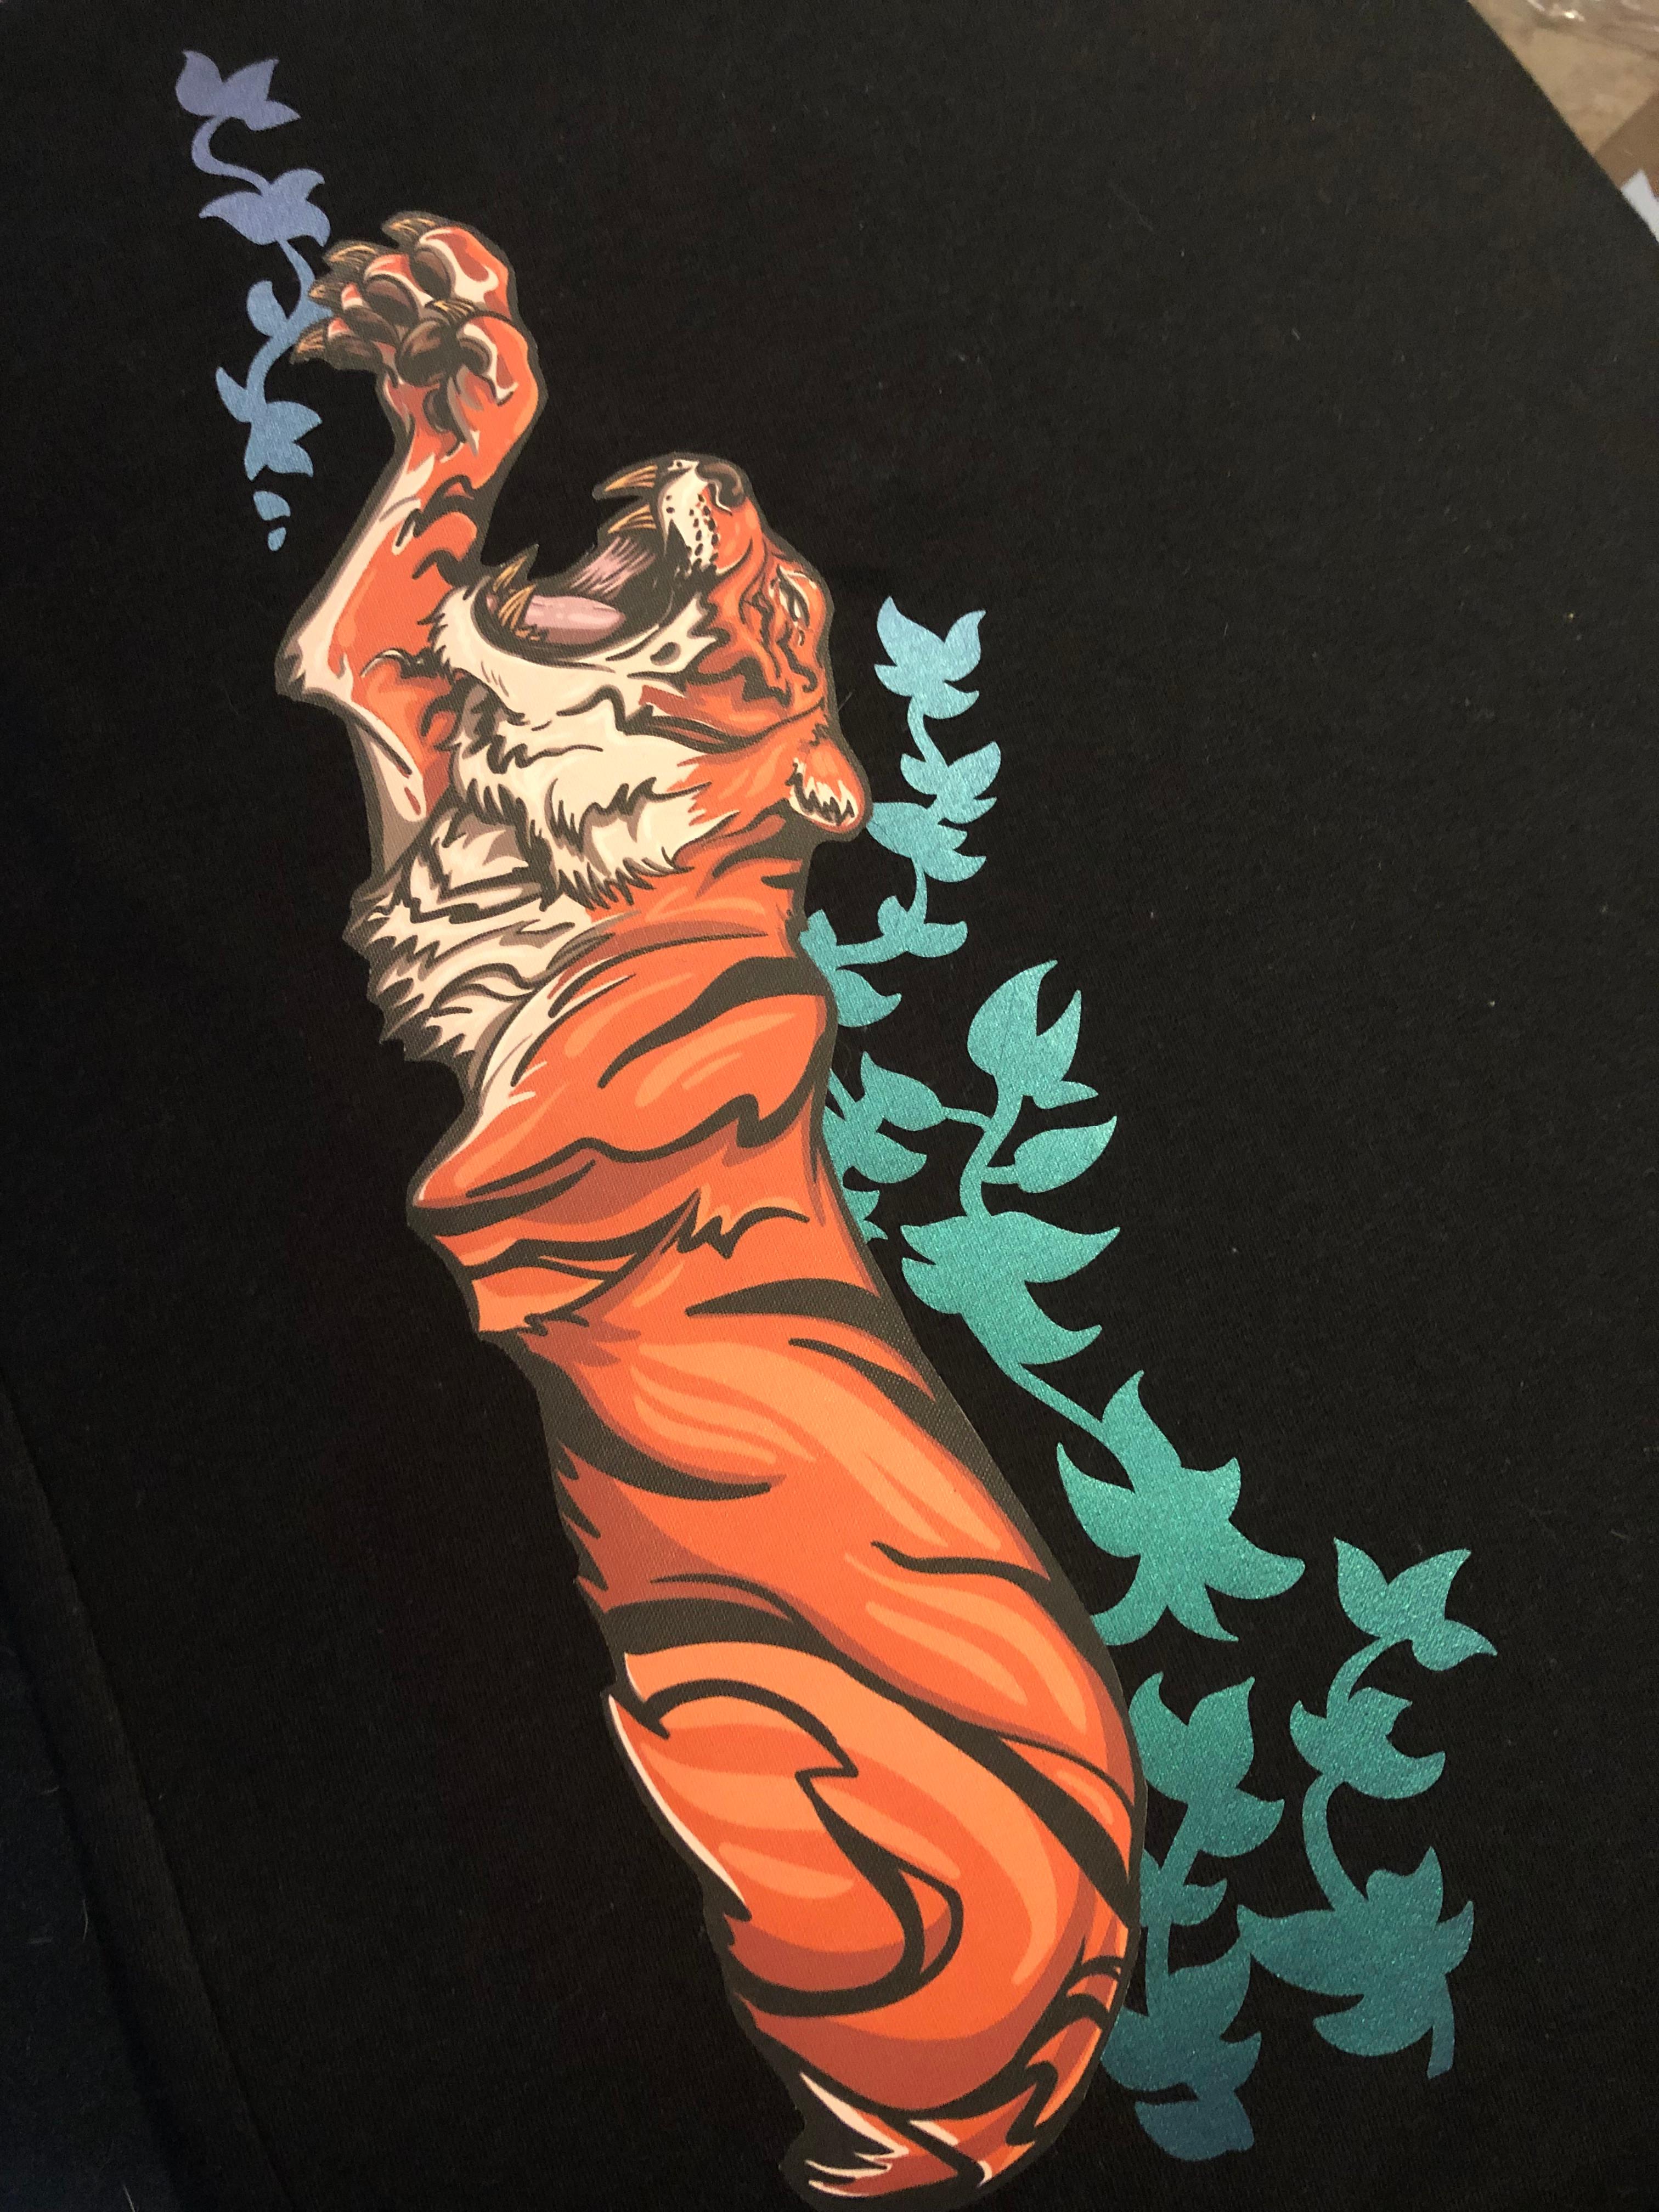 Printed vinyl heat transfer t shirt with color changing vinyl. eNVy Unltd. clothing brand.